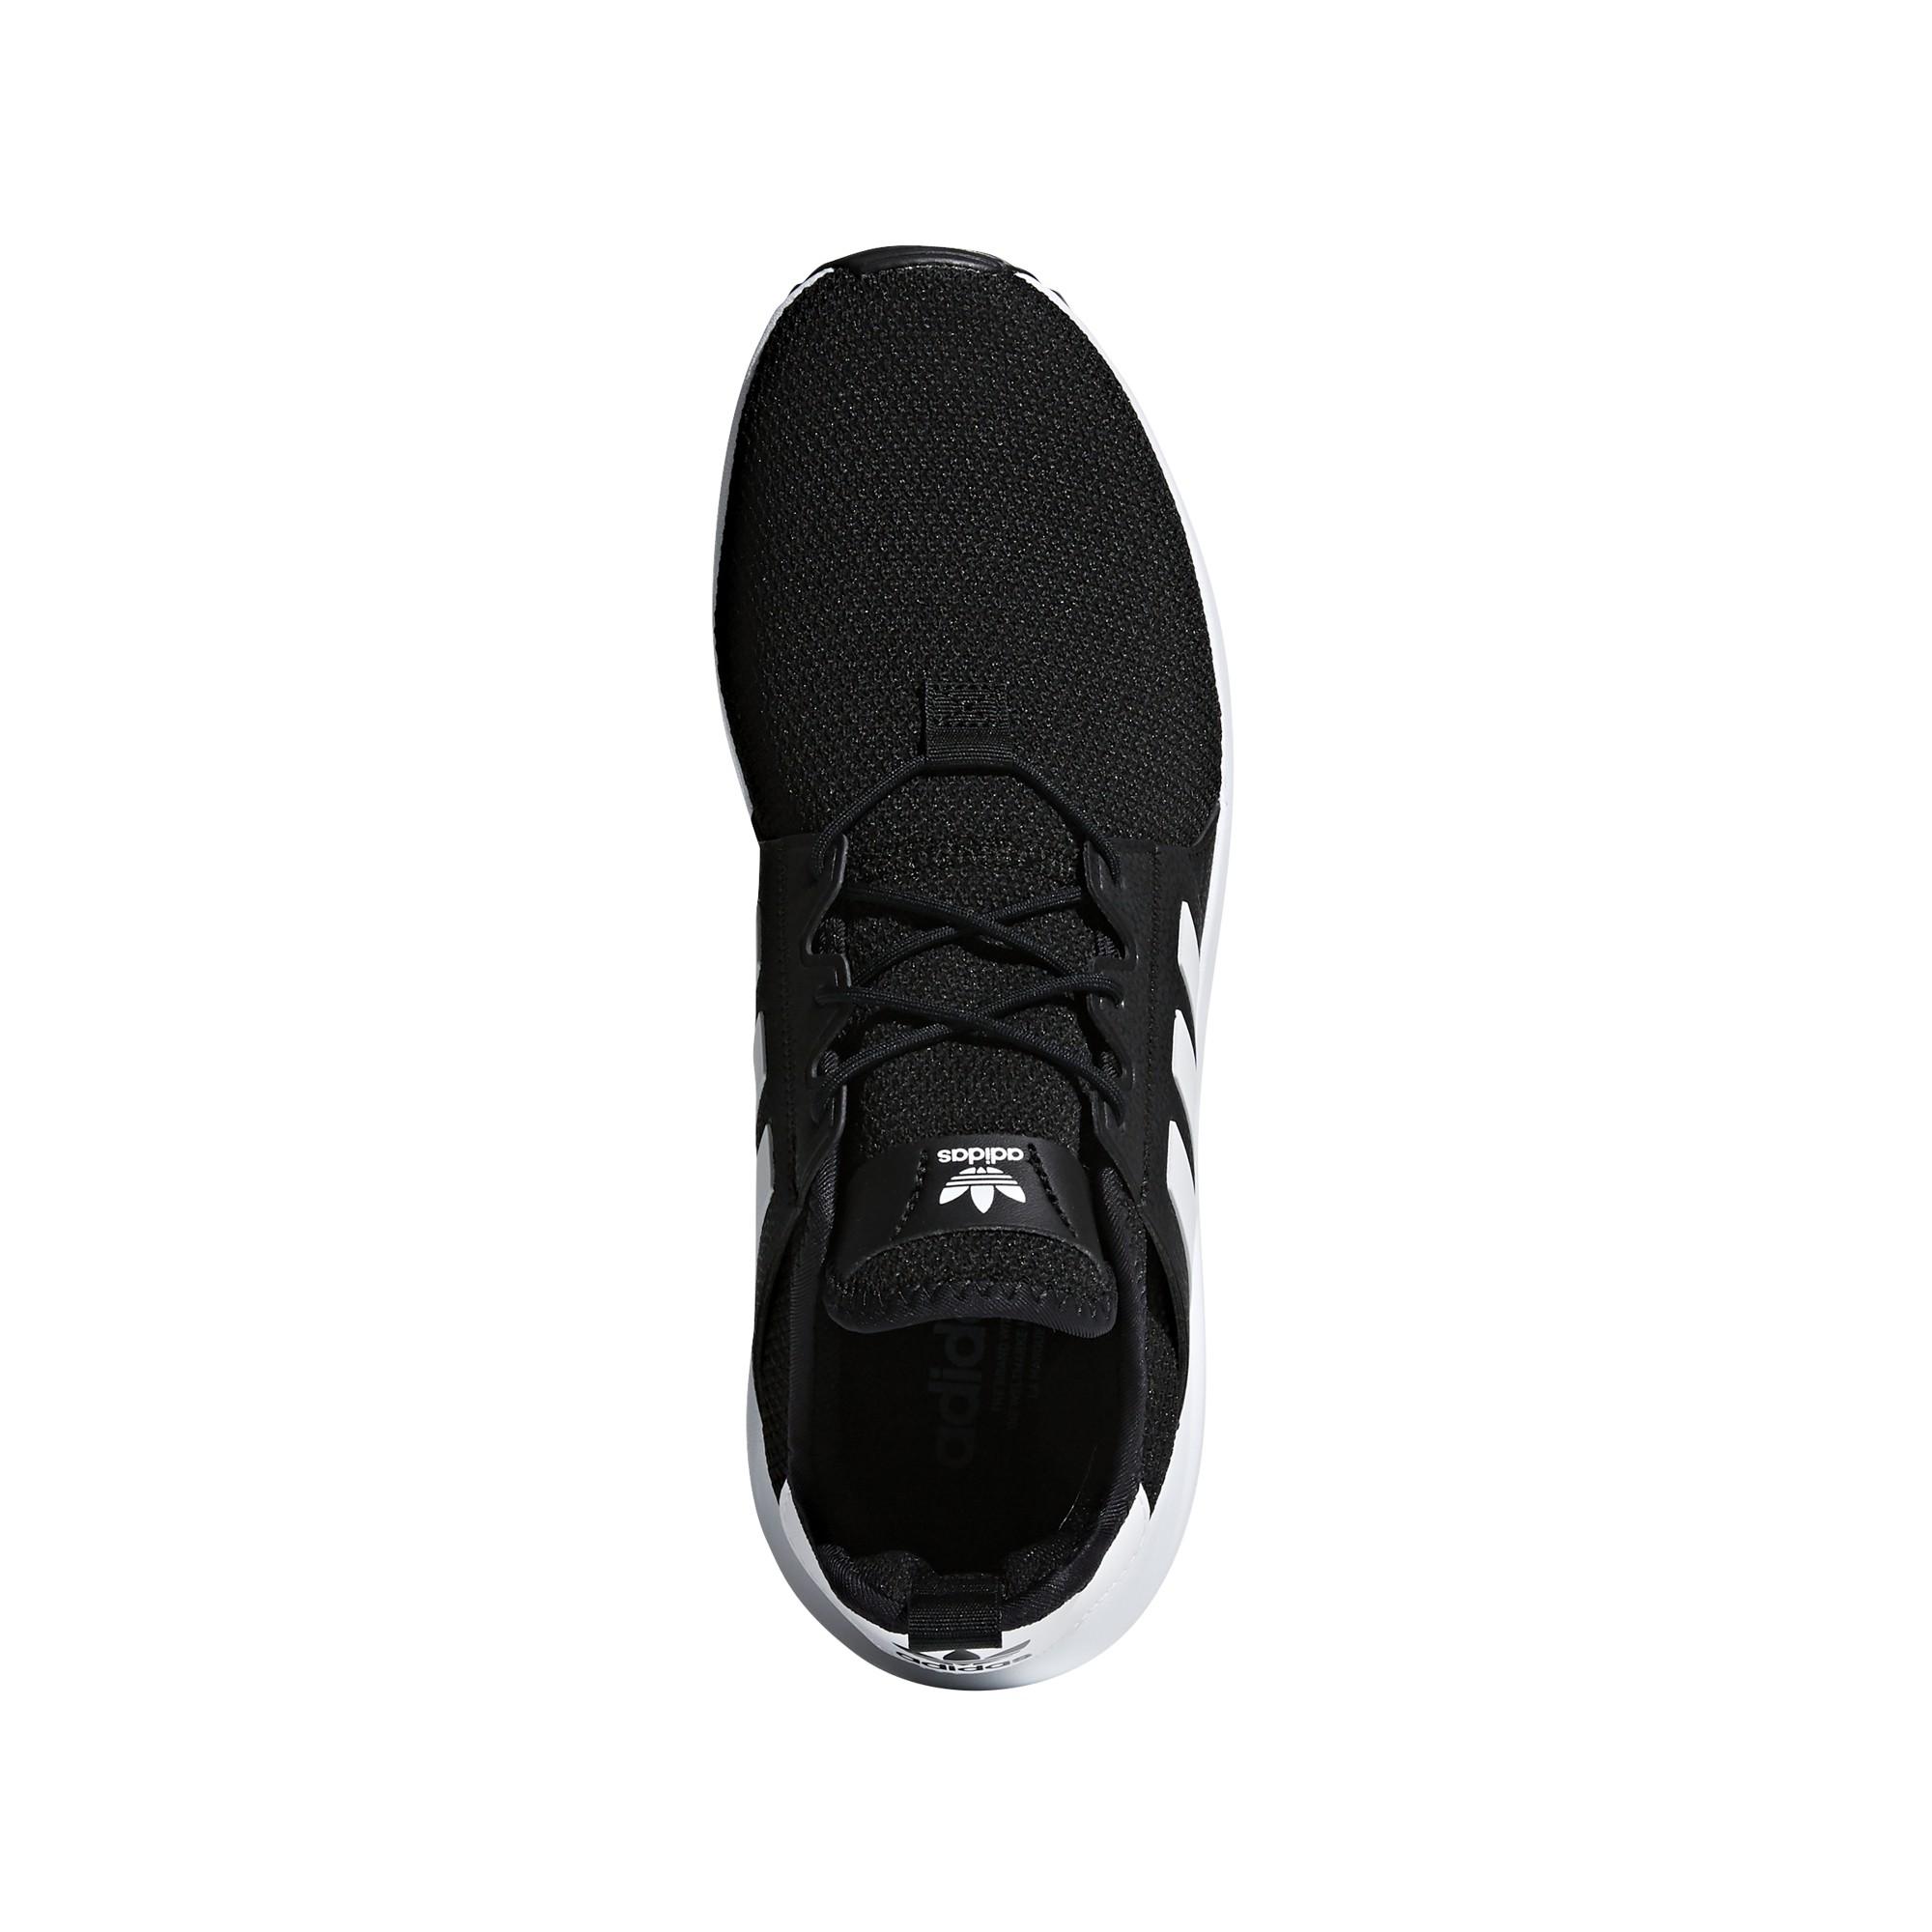 separation shoes e1f6c a9de1 style ADIDAS xplr nerobianco cq2405 - acquista su sportshock